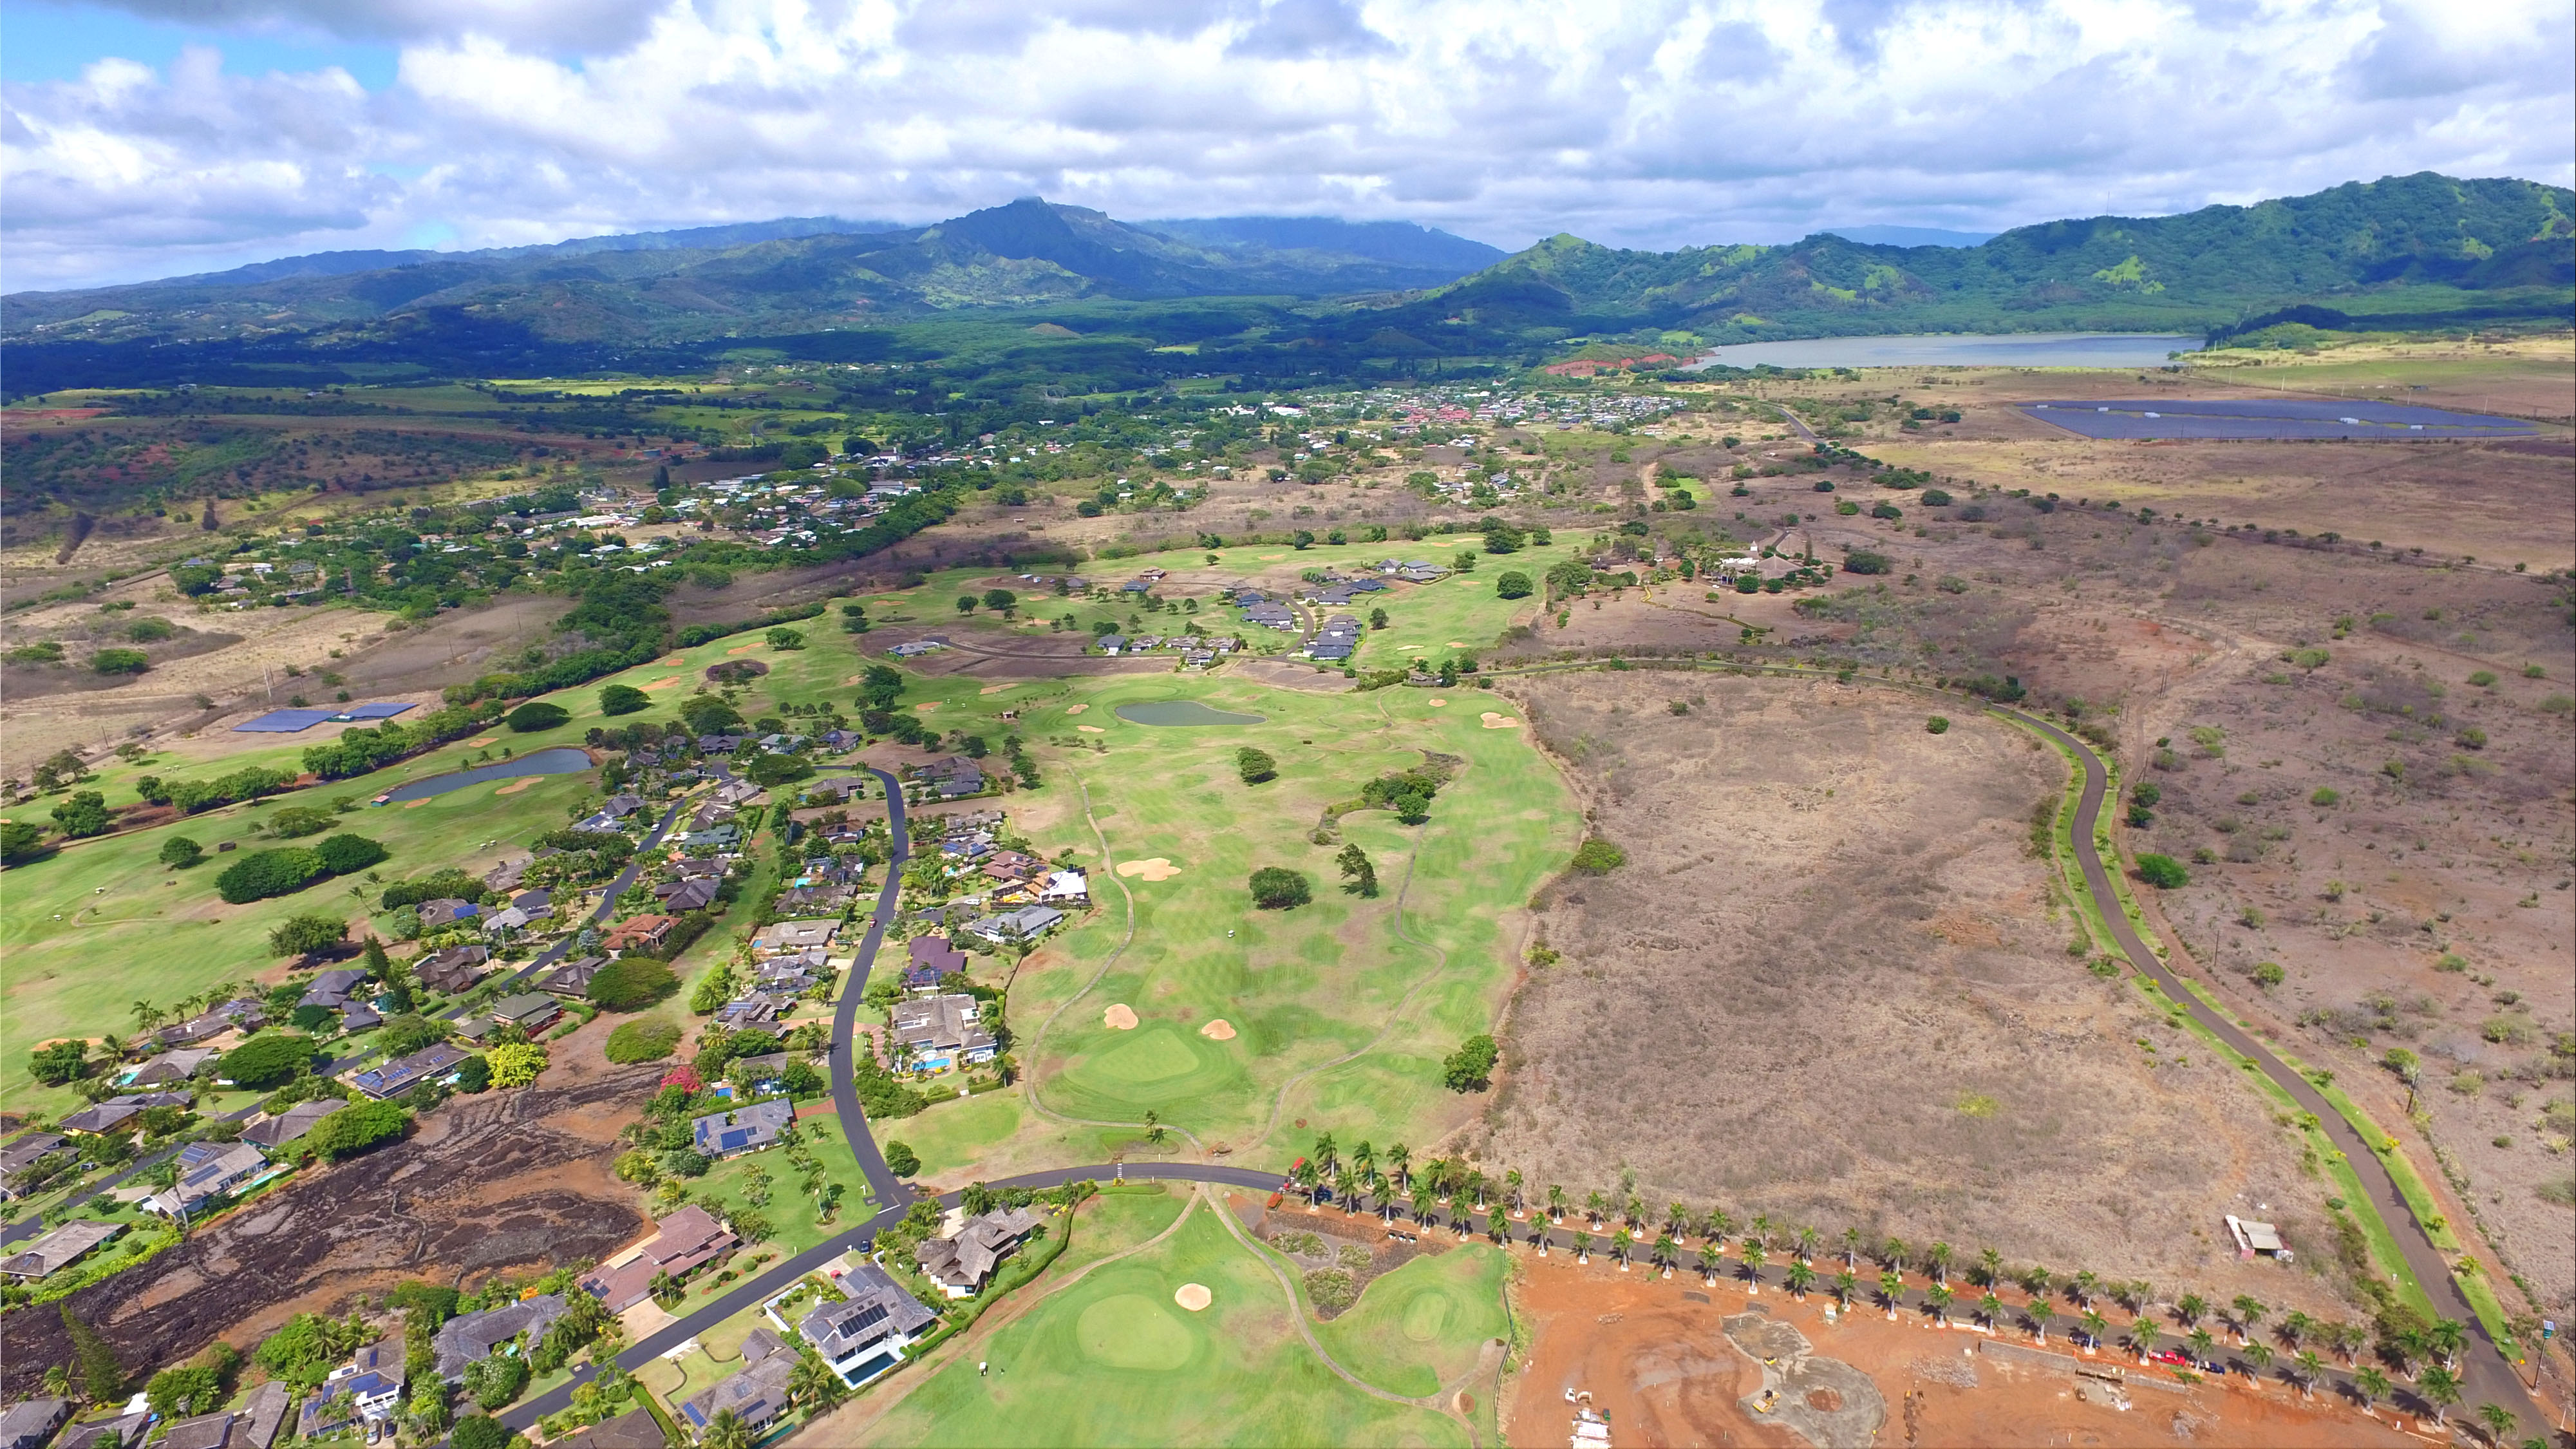 Đất đai vì Bán tại Investment Opportunity 5425 Pau A Laka St Koloa, Hawaii, 96756 Hoa Kỳ